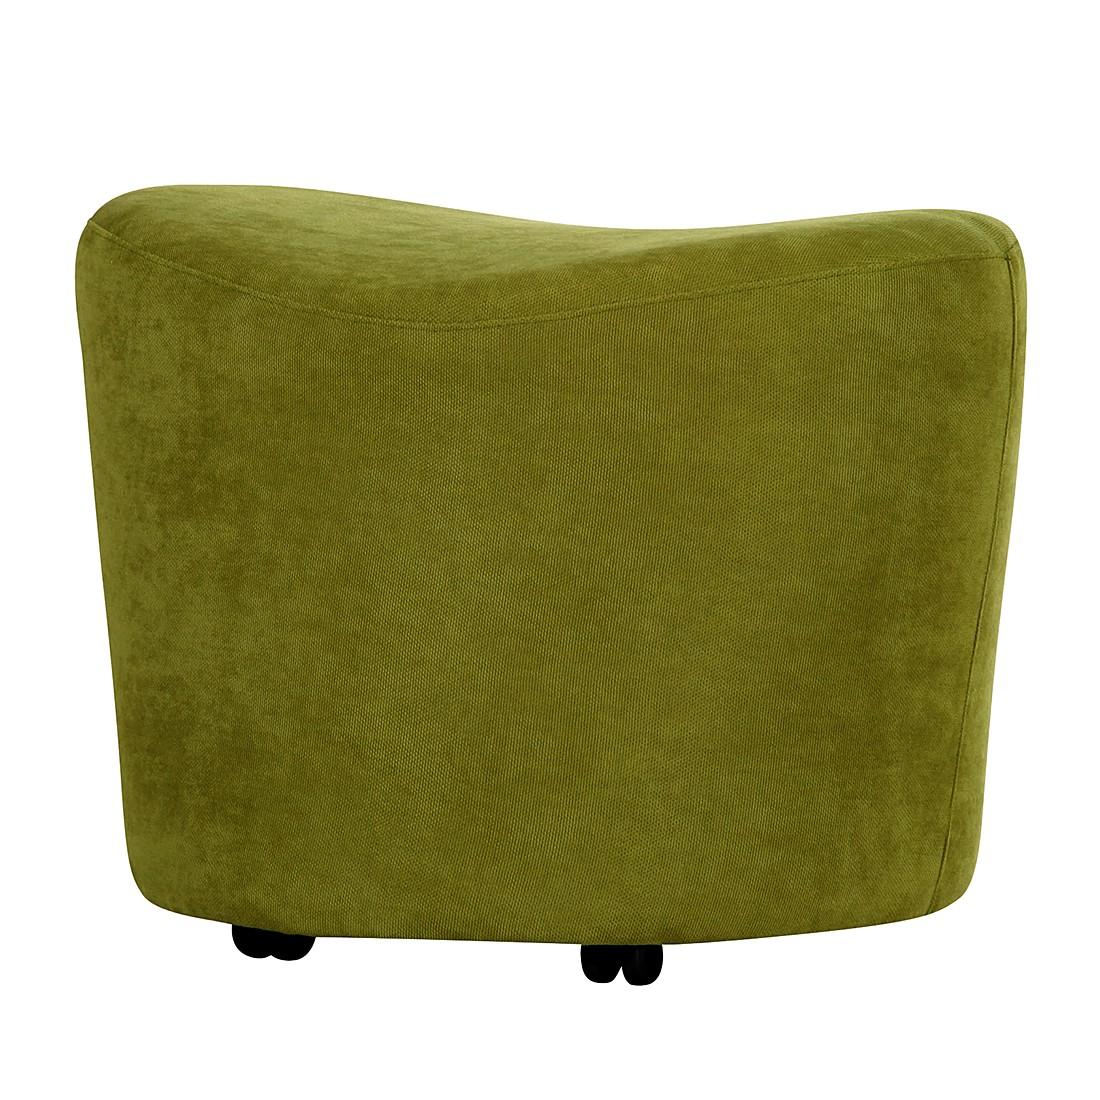 Hocker Kenai – Samt Grün, roomscape online bestellen